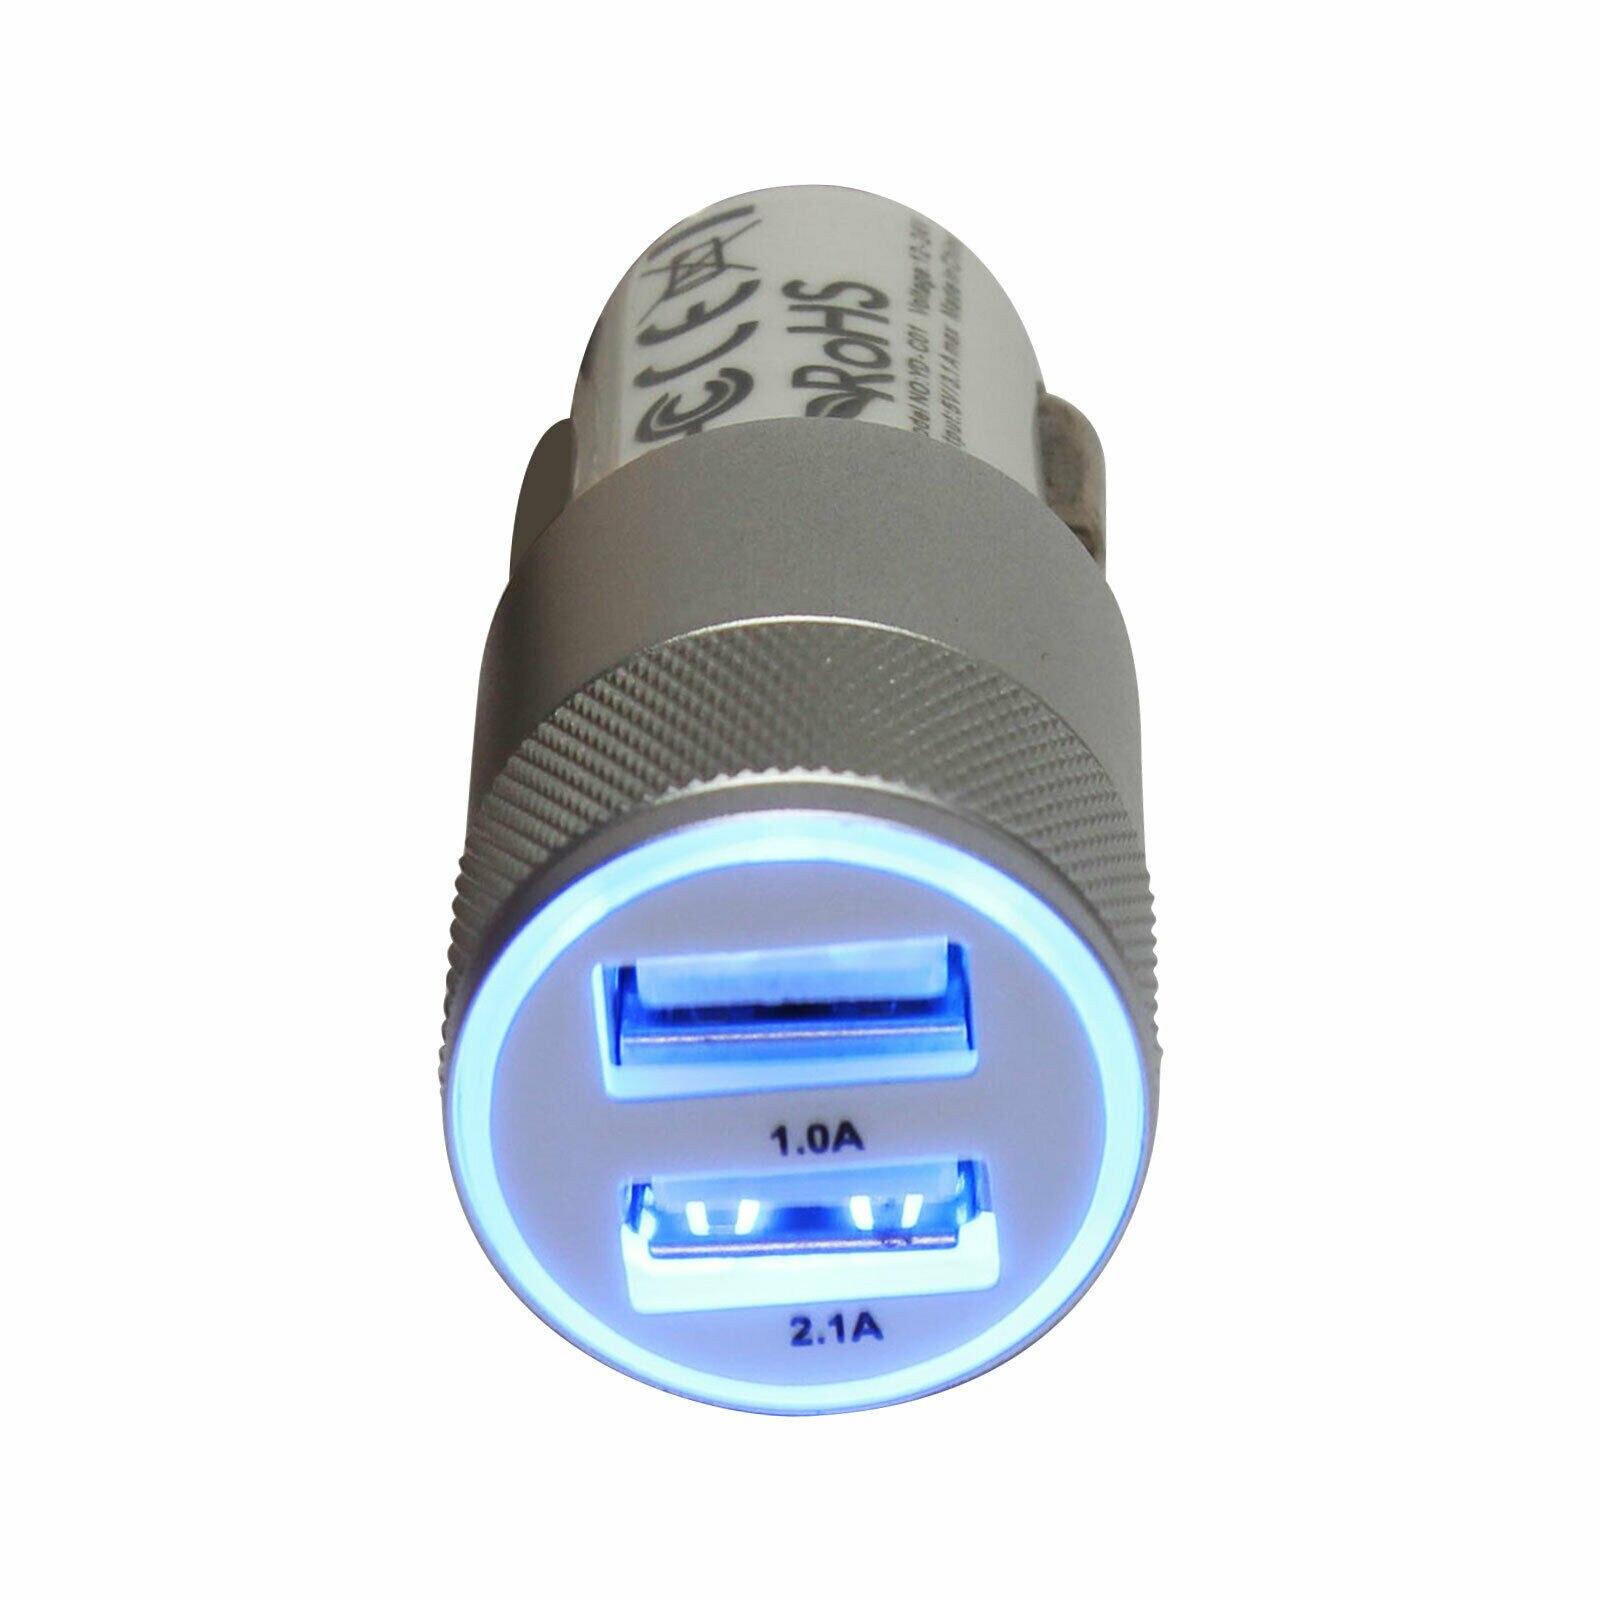 12-24V Car Charger 2 Port Accessories Cigar Lighter Dual USB Mobile Phone